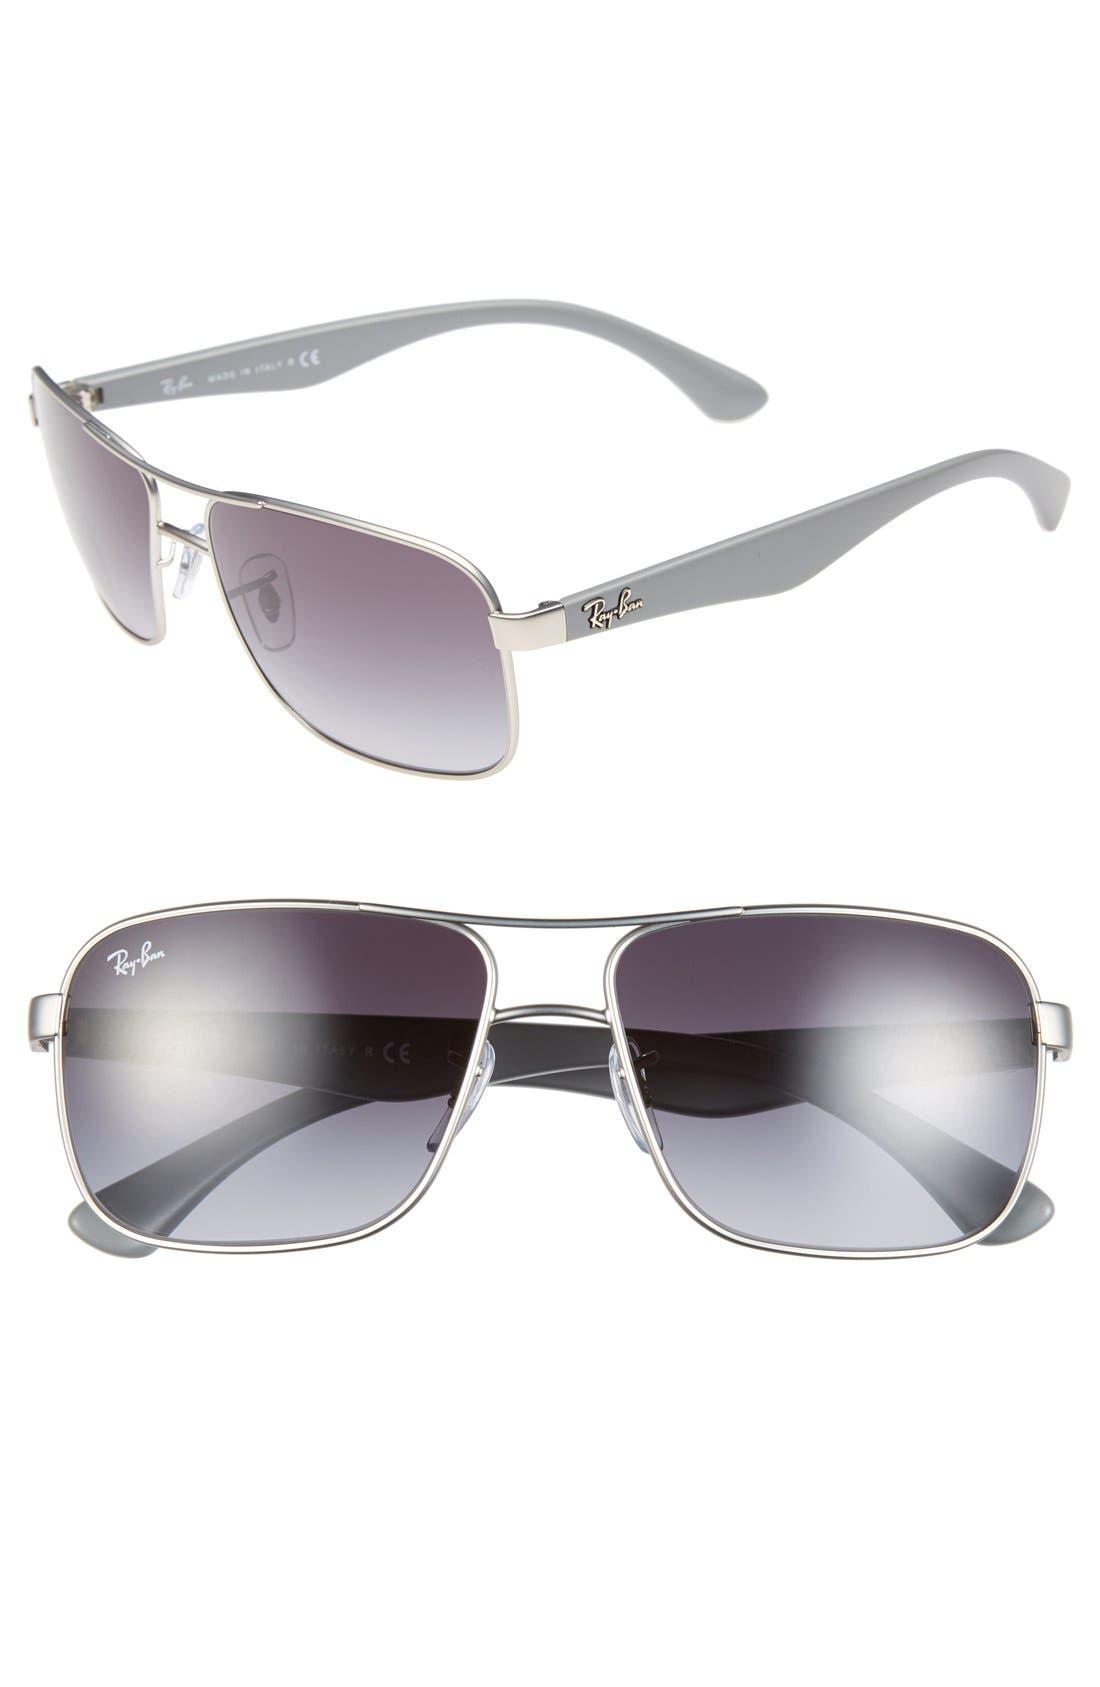 59mm Pilot Sunglasses,                             Main thumbnail 1, color,                             040